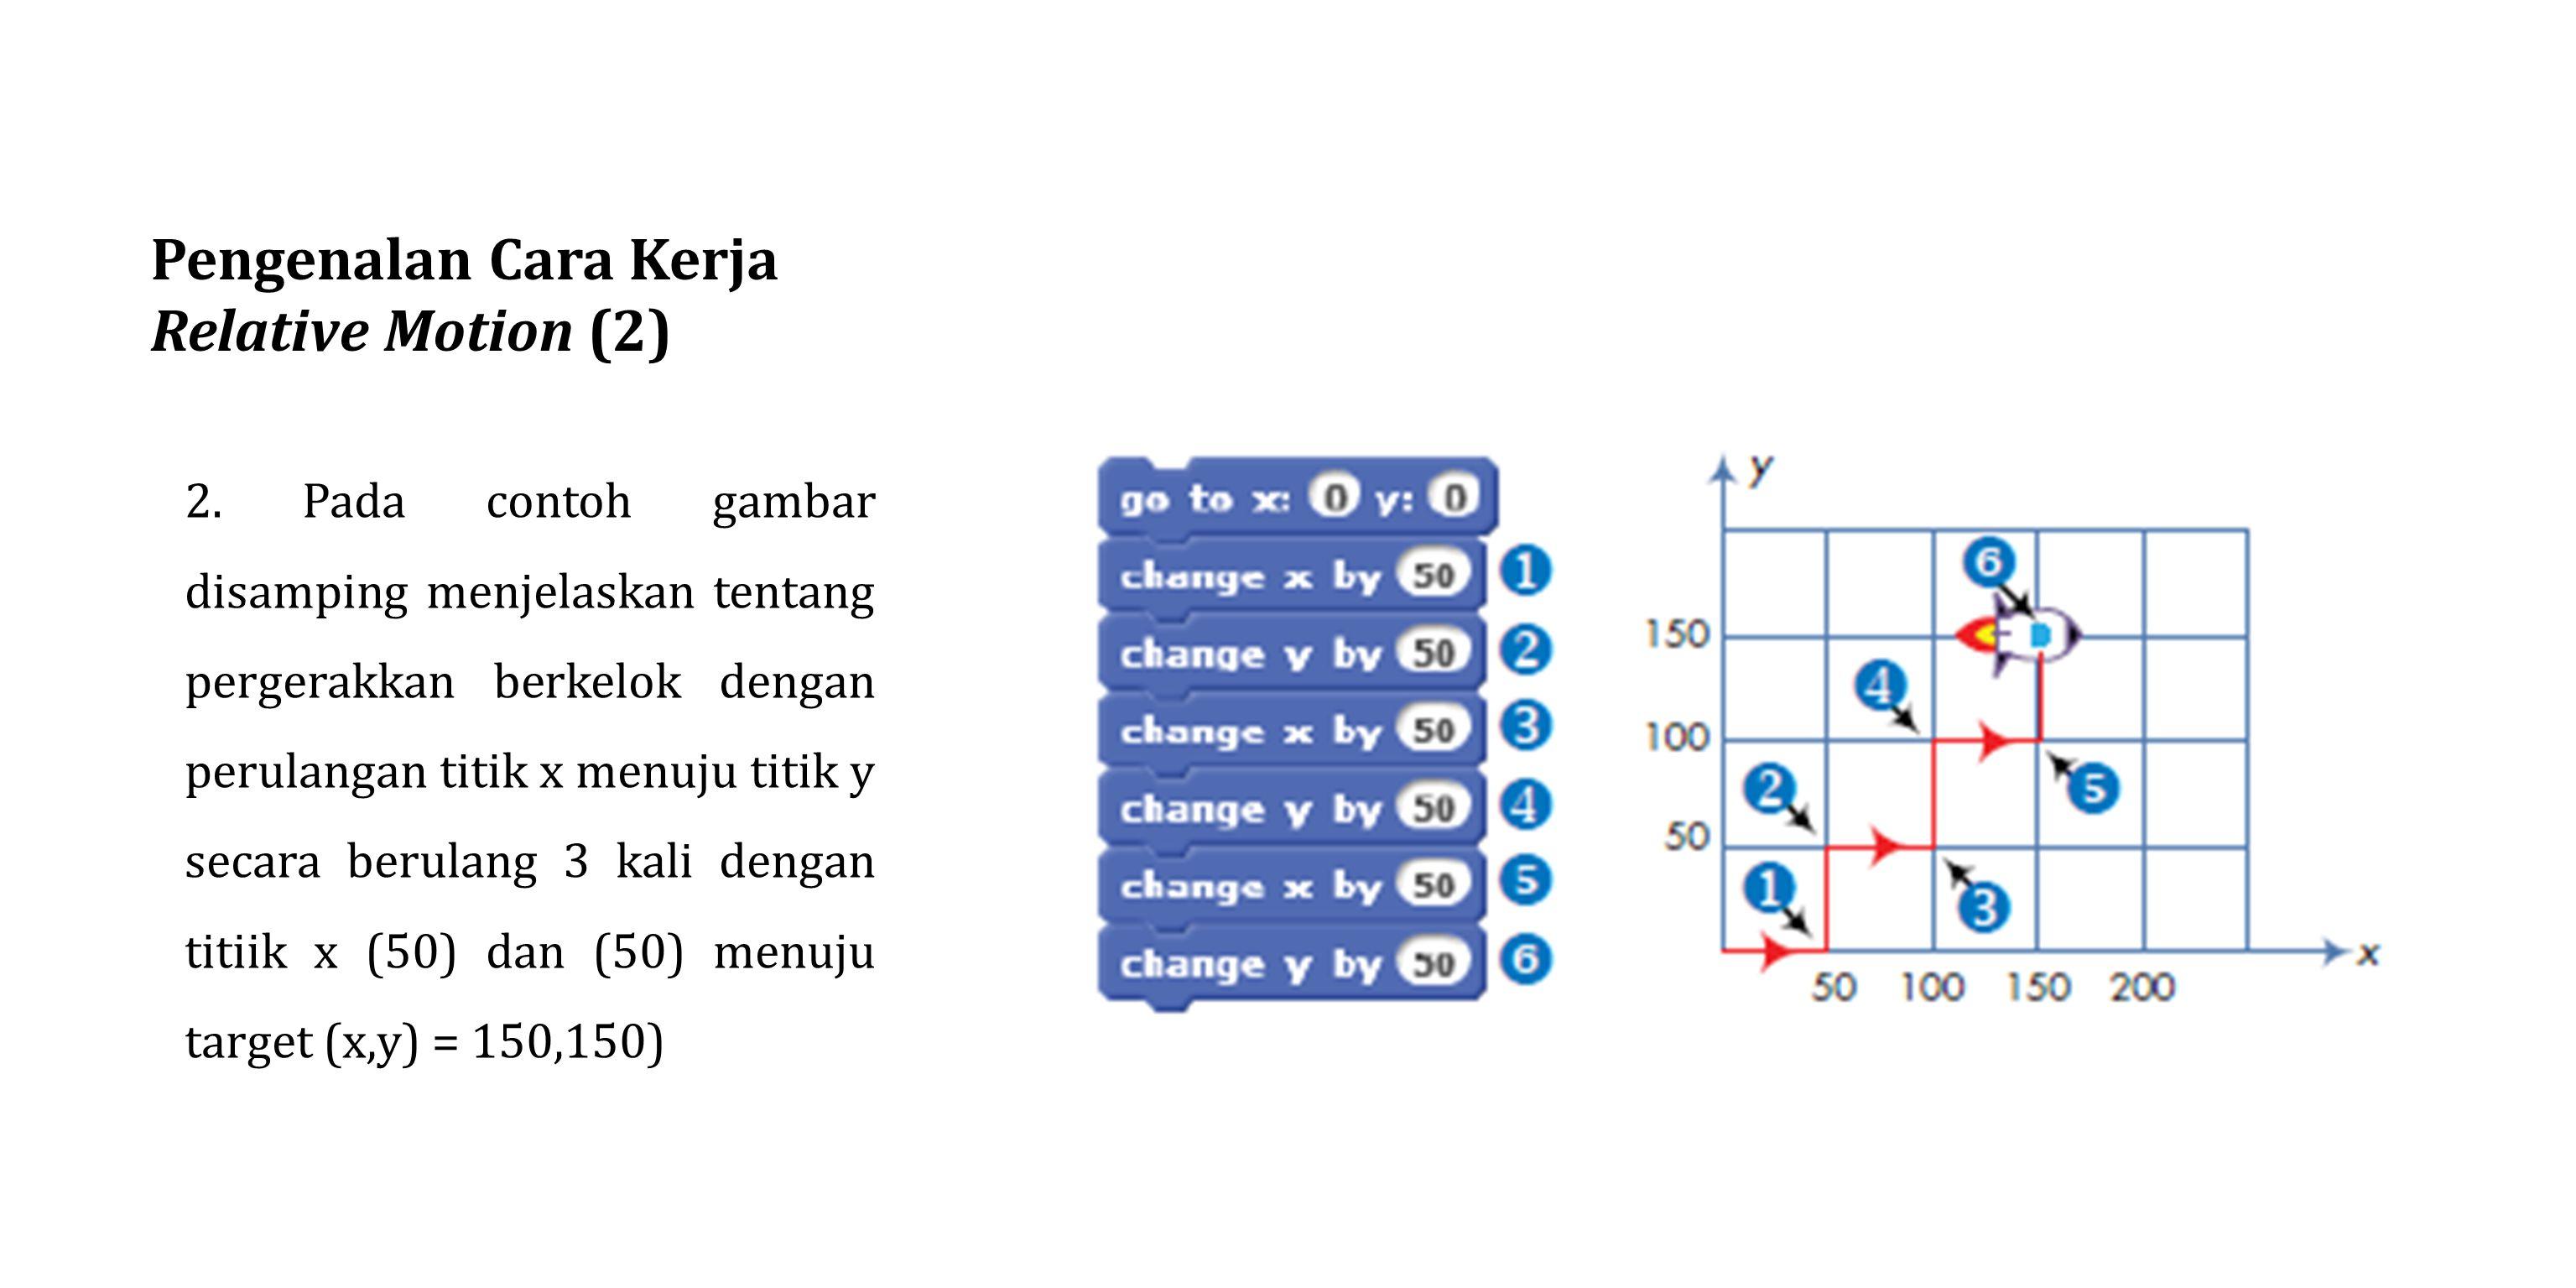 Pengenalan Cara Kerja Relative Motion (2)